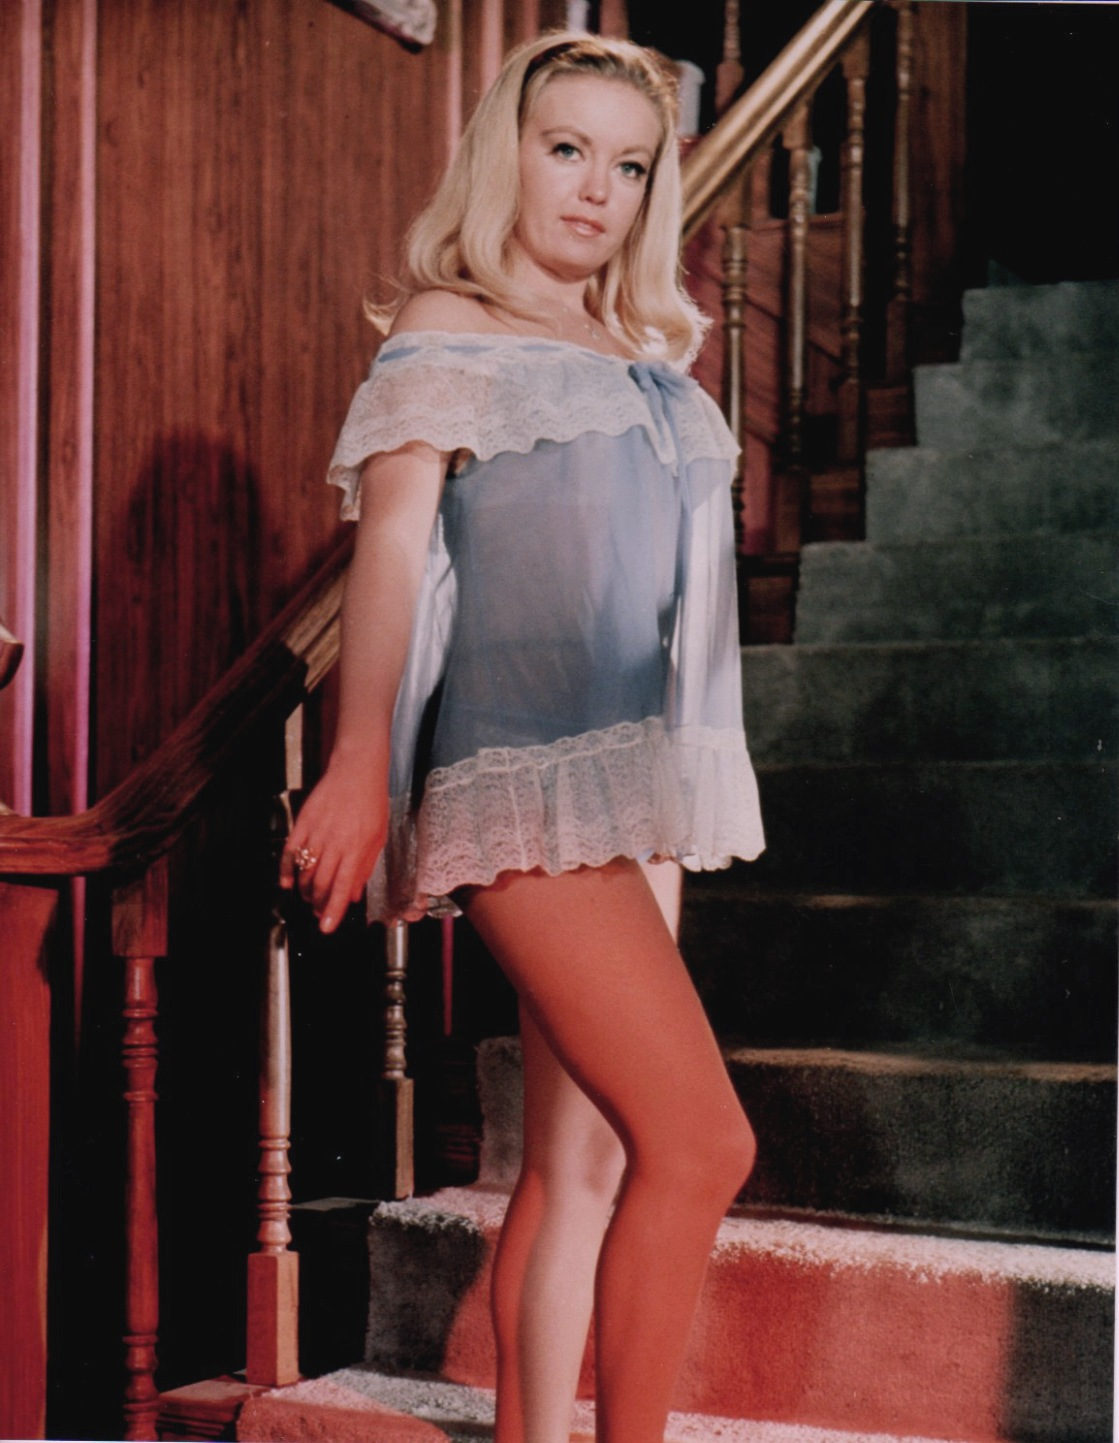 Leslie Parrish in a blue nightie